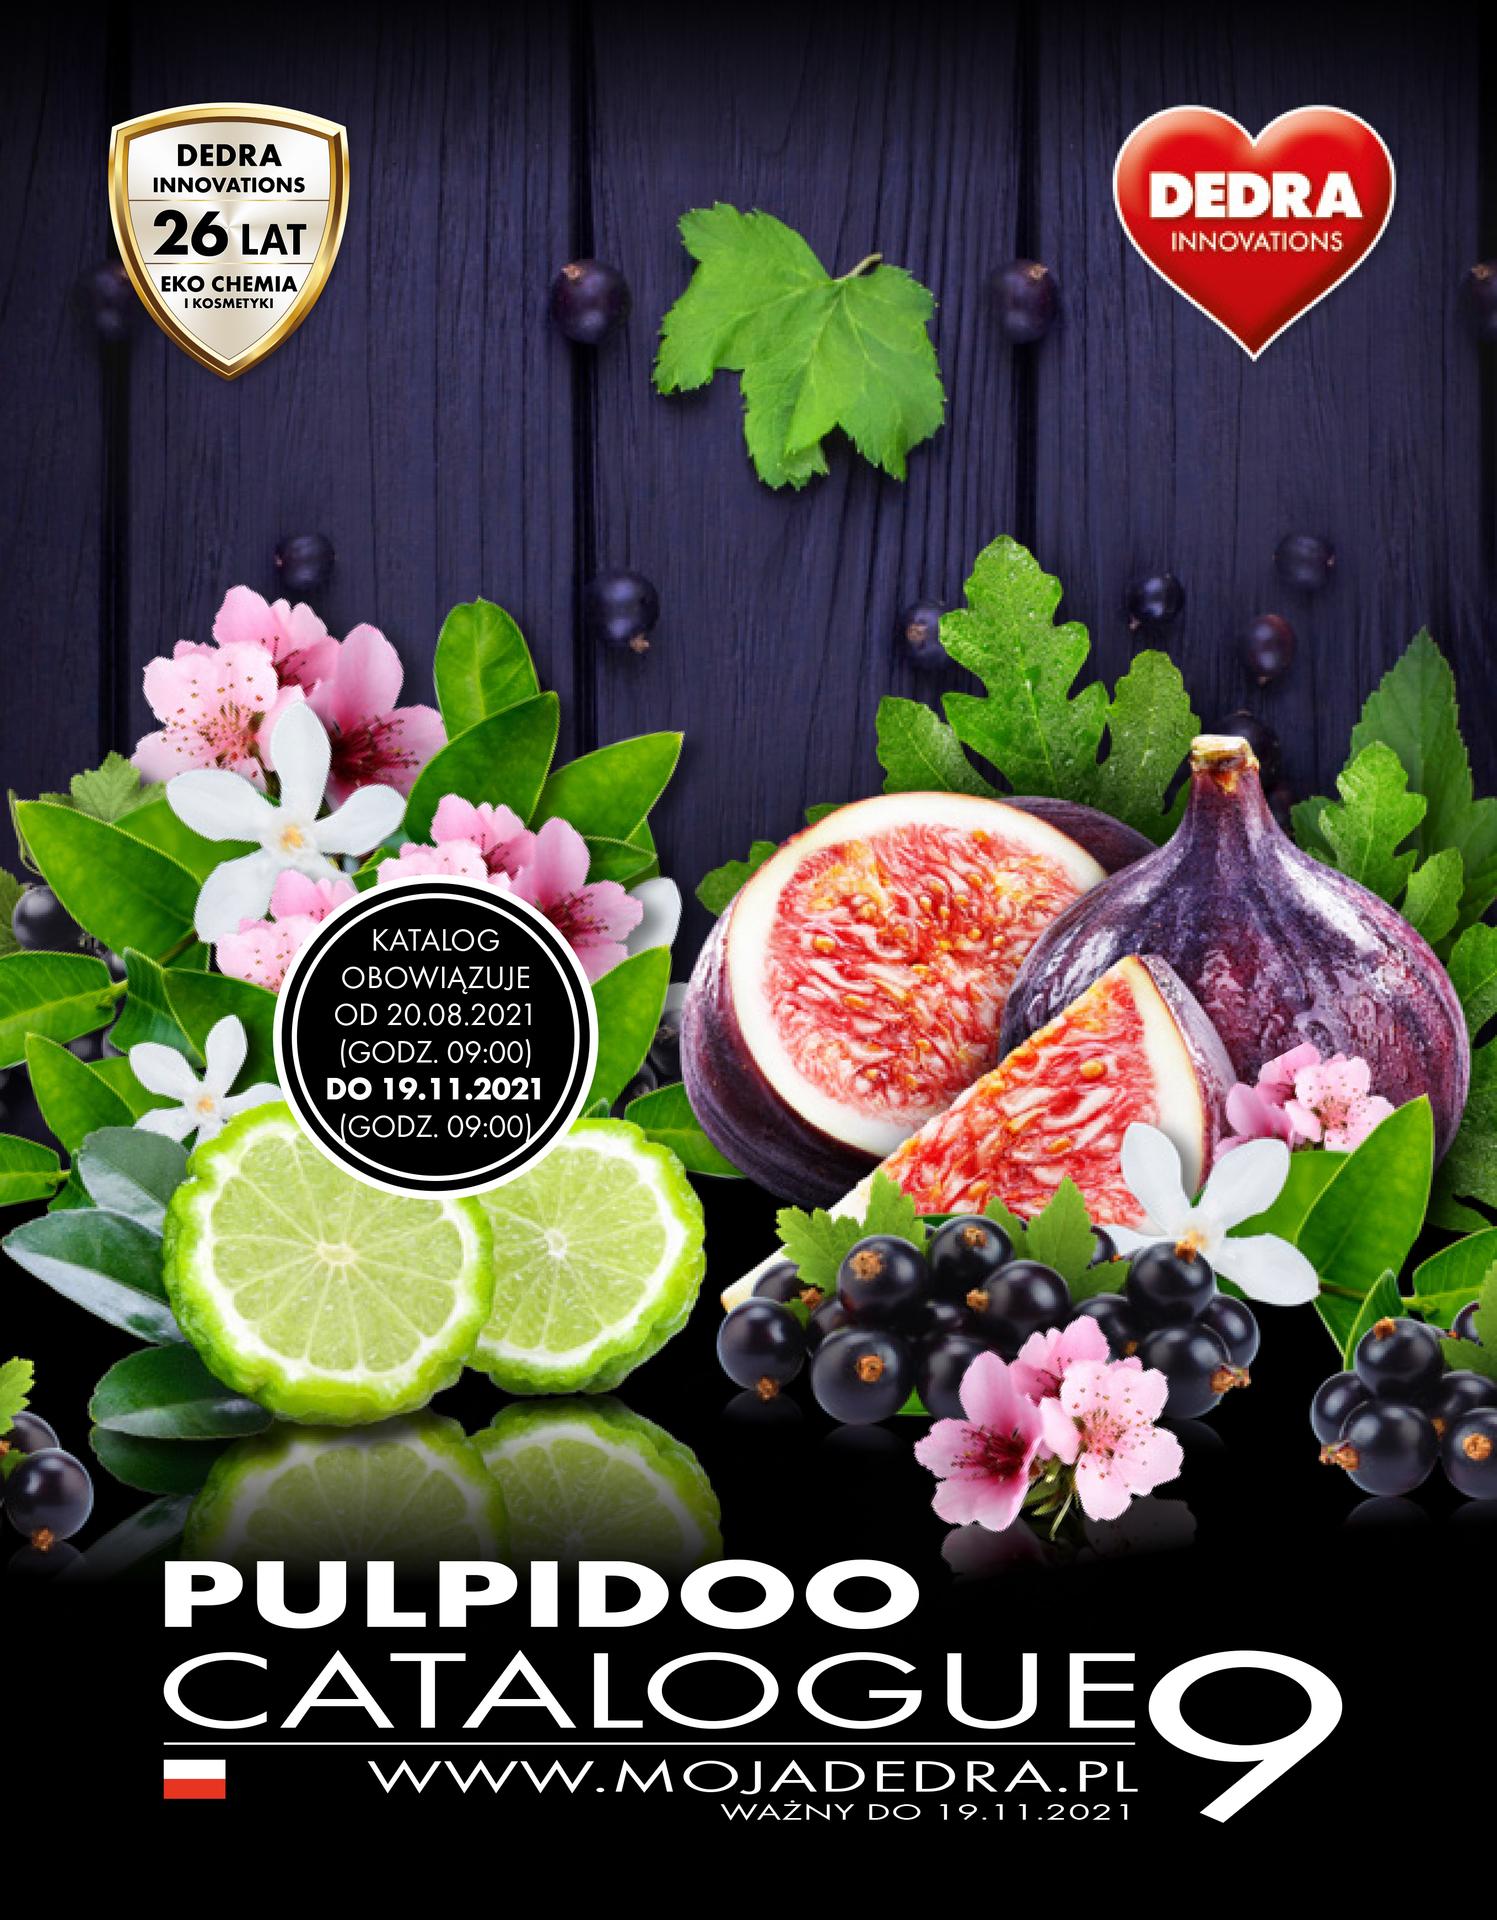 http://katalogy.dedra.cz/katalog-09-2021-pulpidoo-pl/